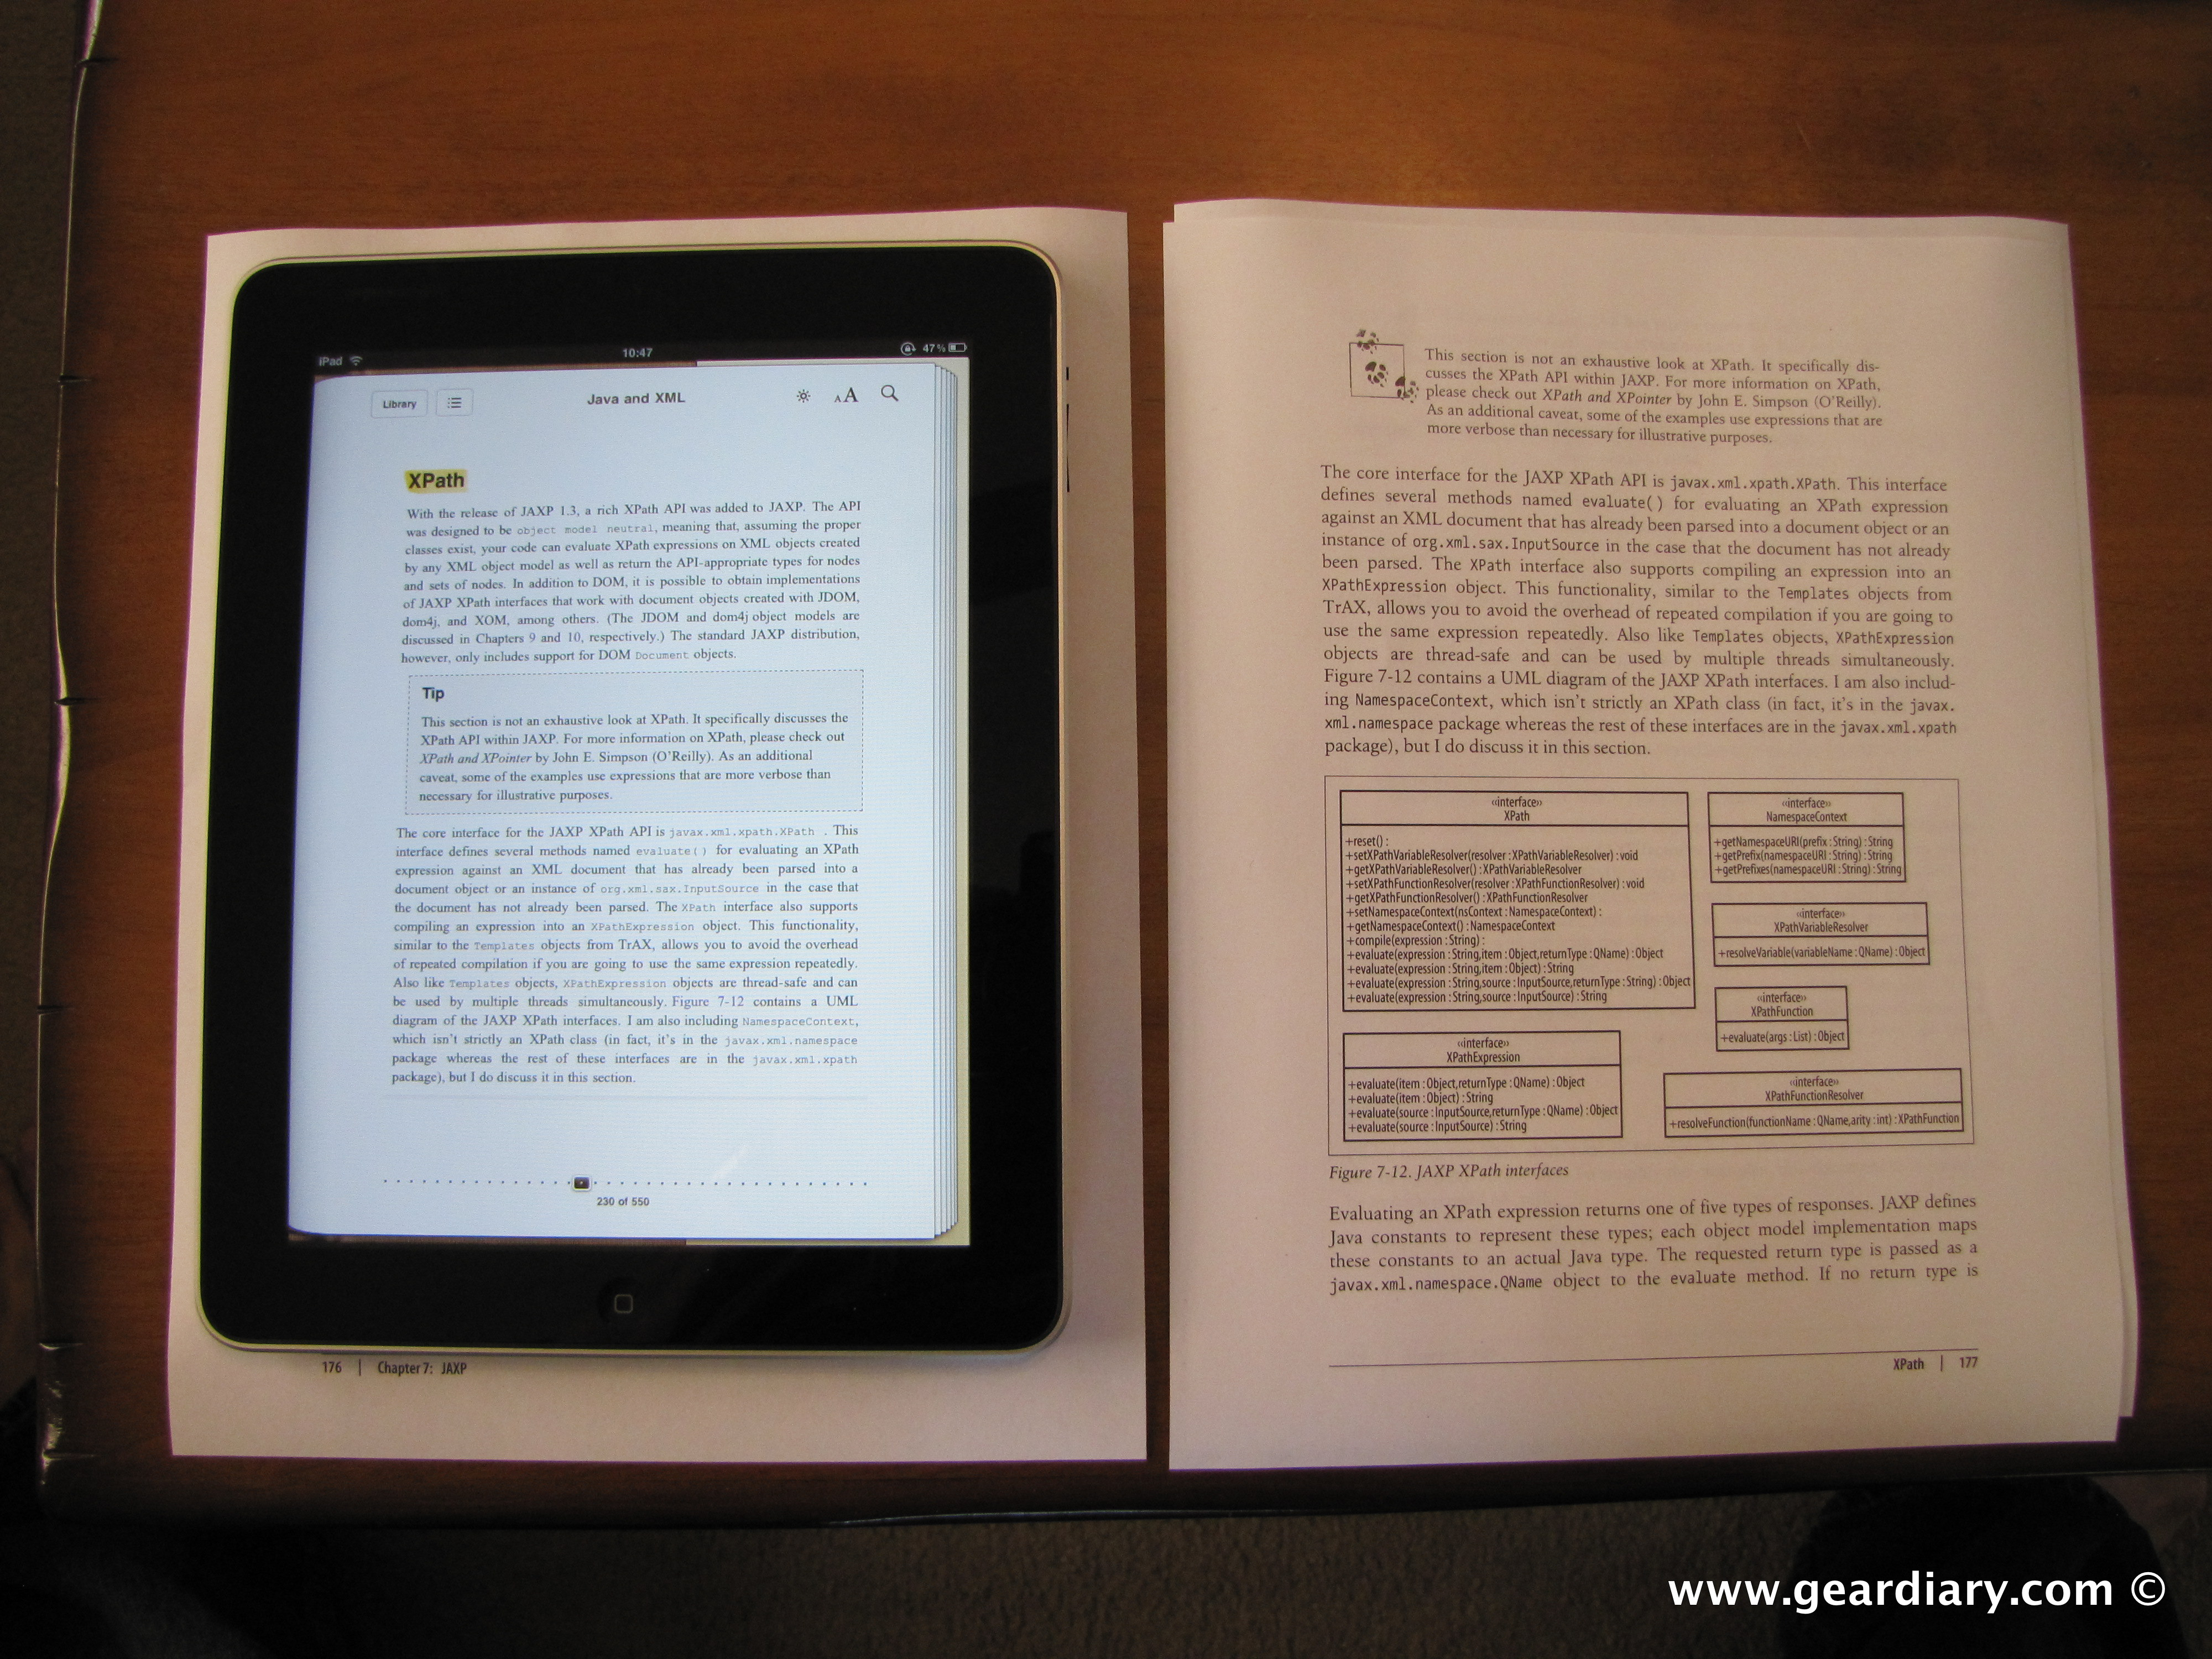 open epub ebook on ipad